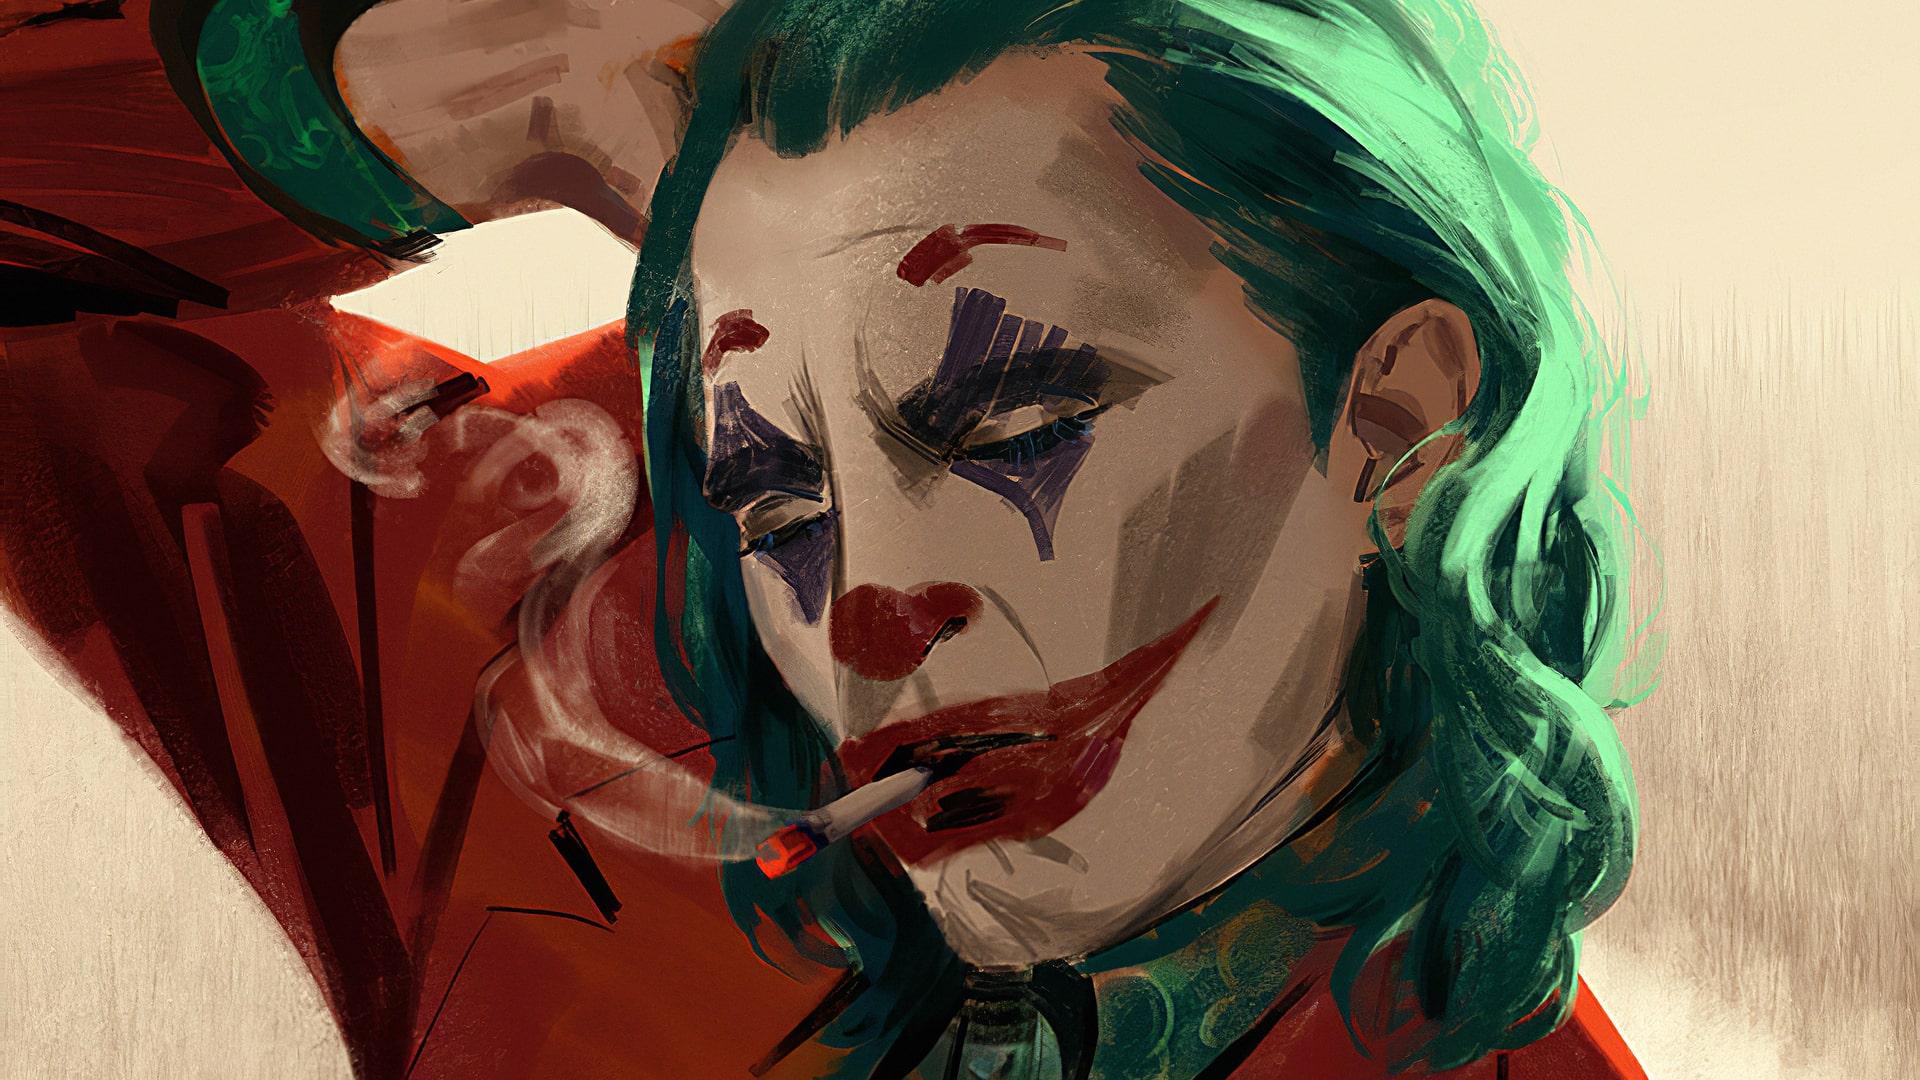 joker wallpaper, wallpaper, joker smoking